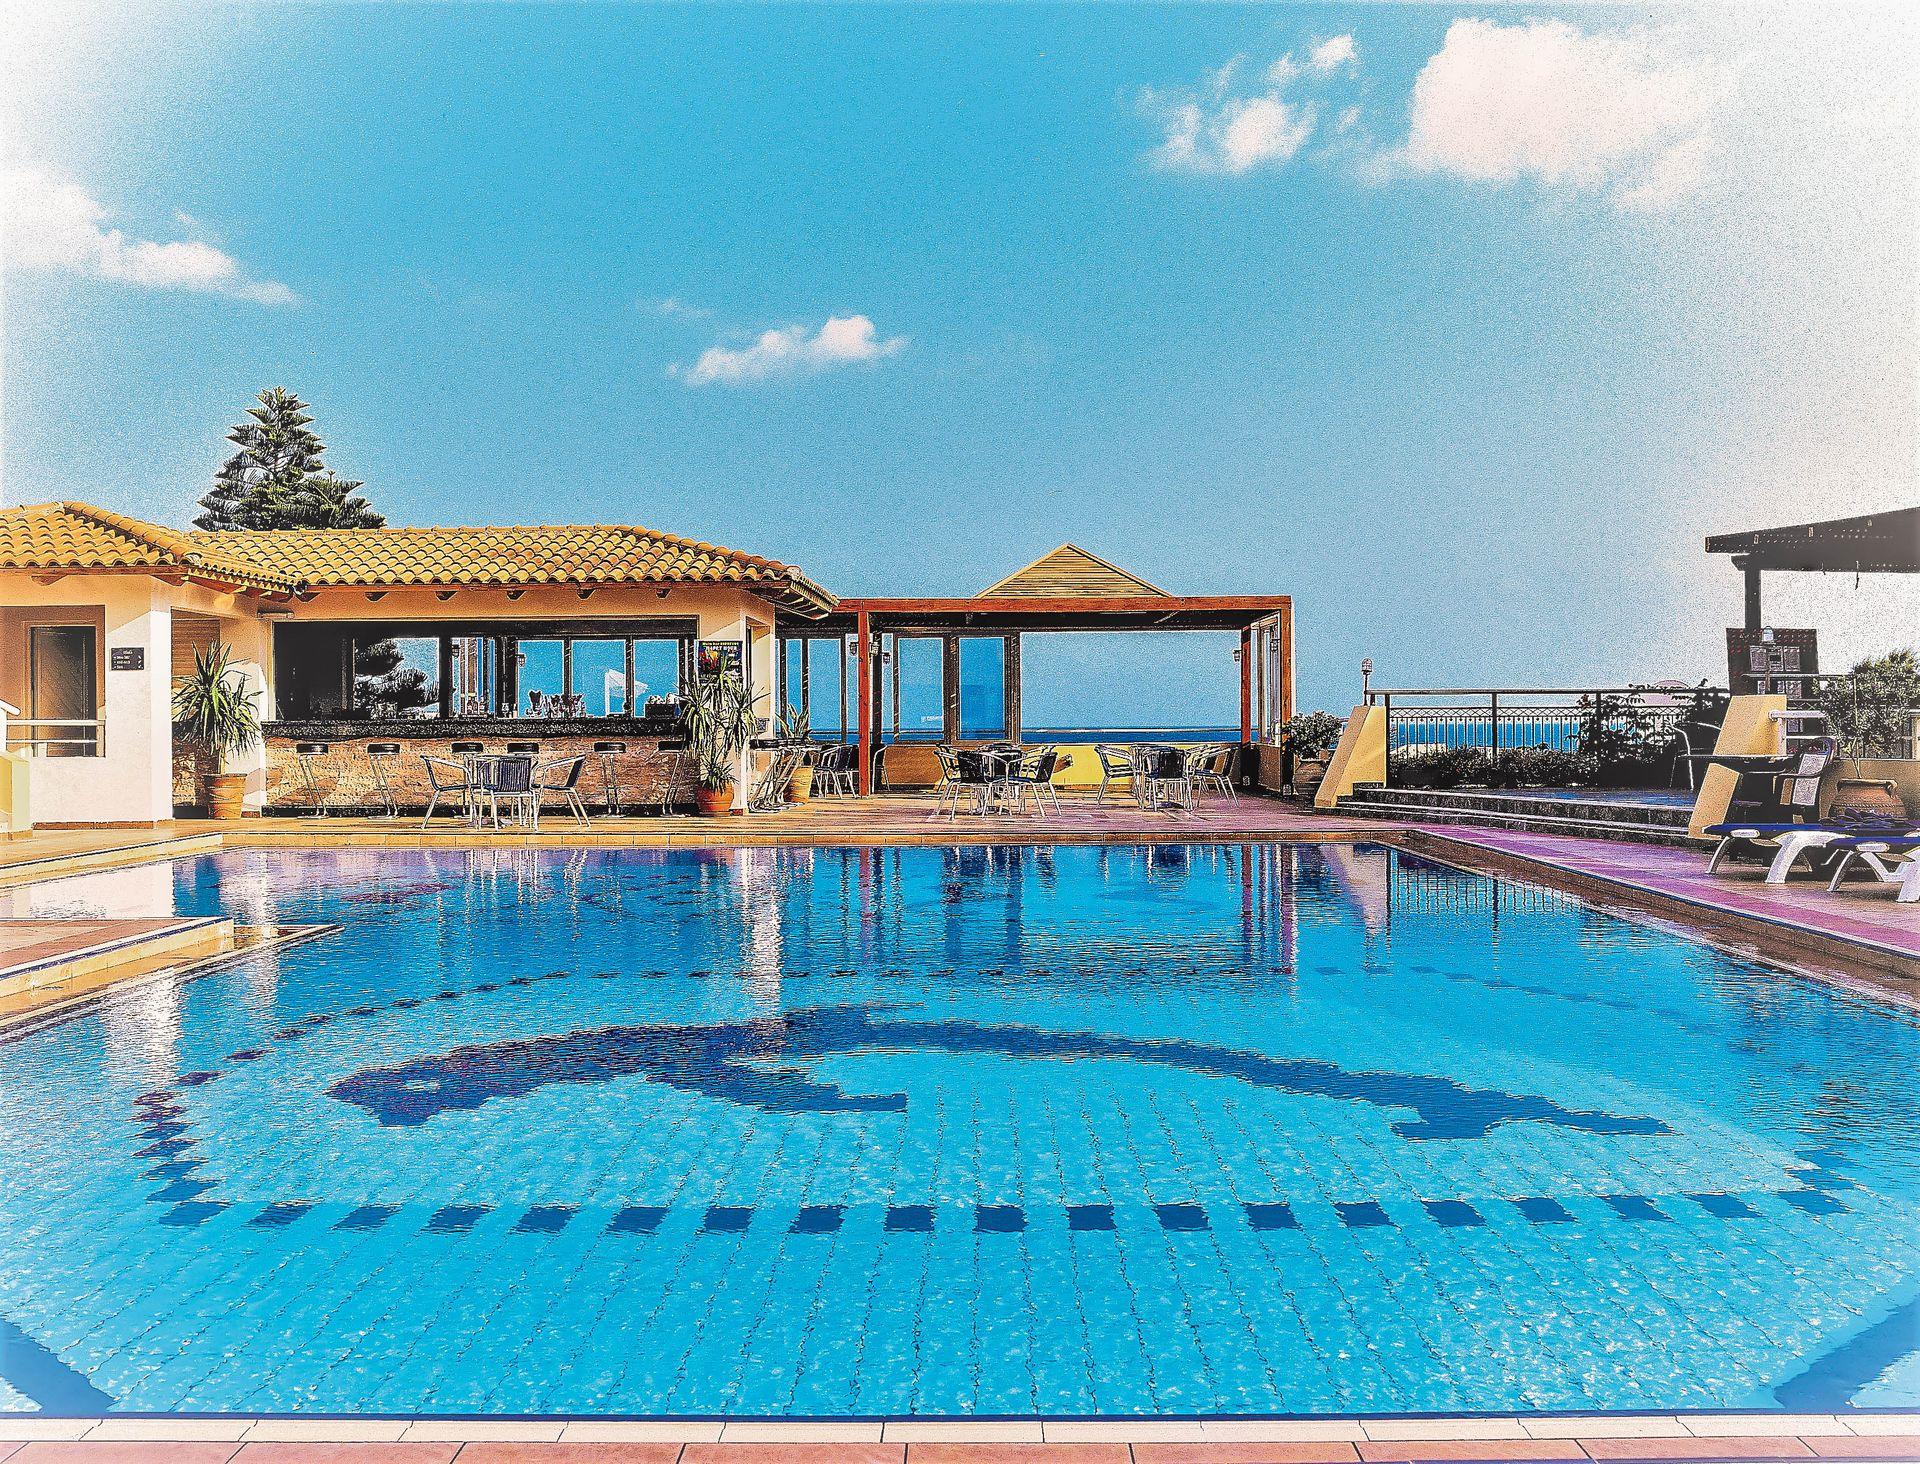 4* Castello Village Resort - Λασίθι, Κρήτη ✦ 2 Ημέρες